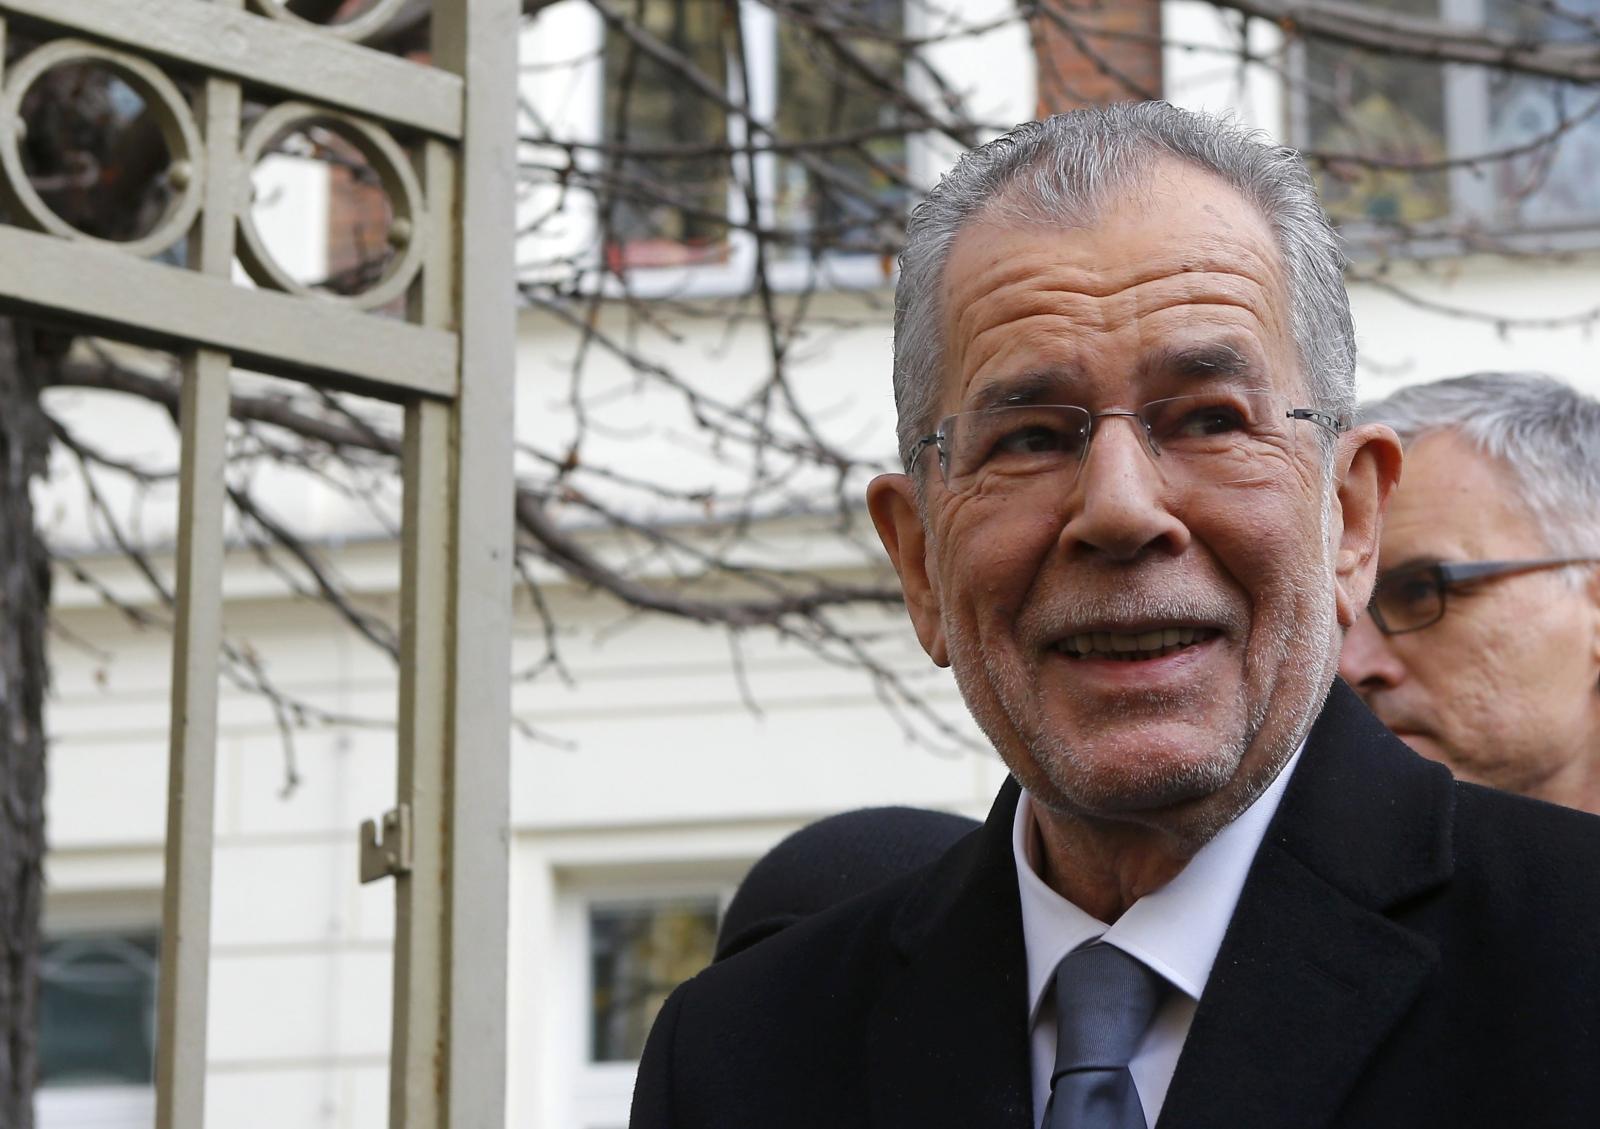 Alexander Van der Bellen takes 'unbeatable lead' in Austria's presidential election